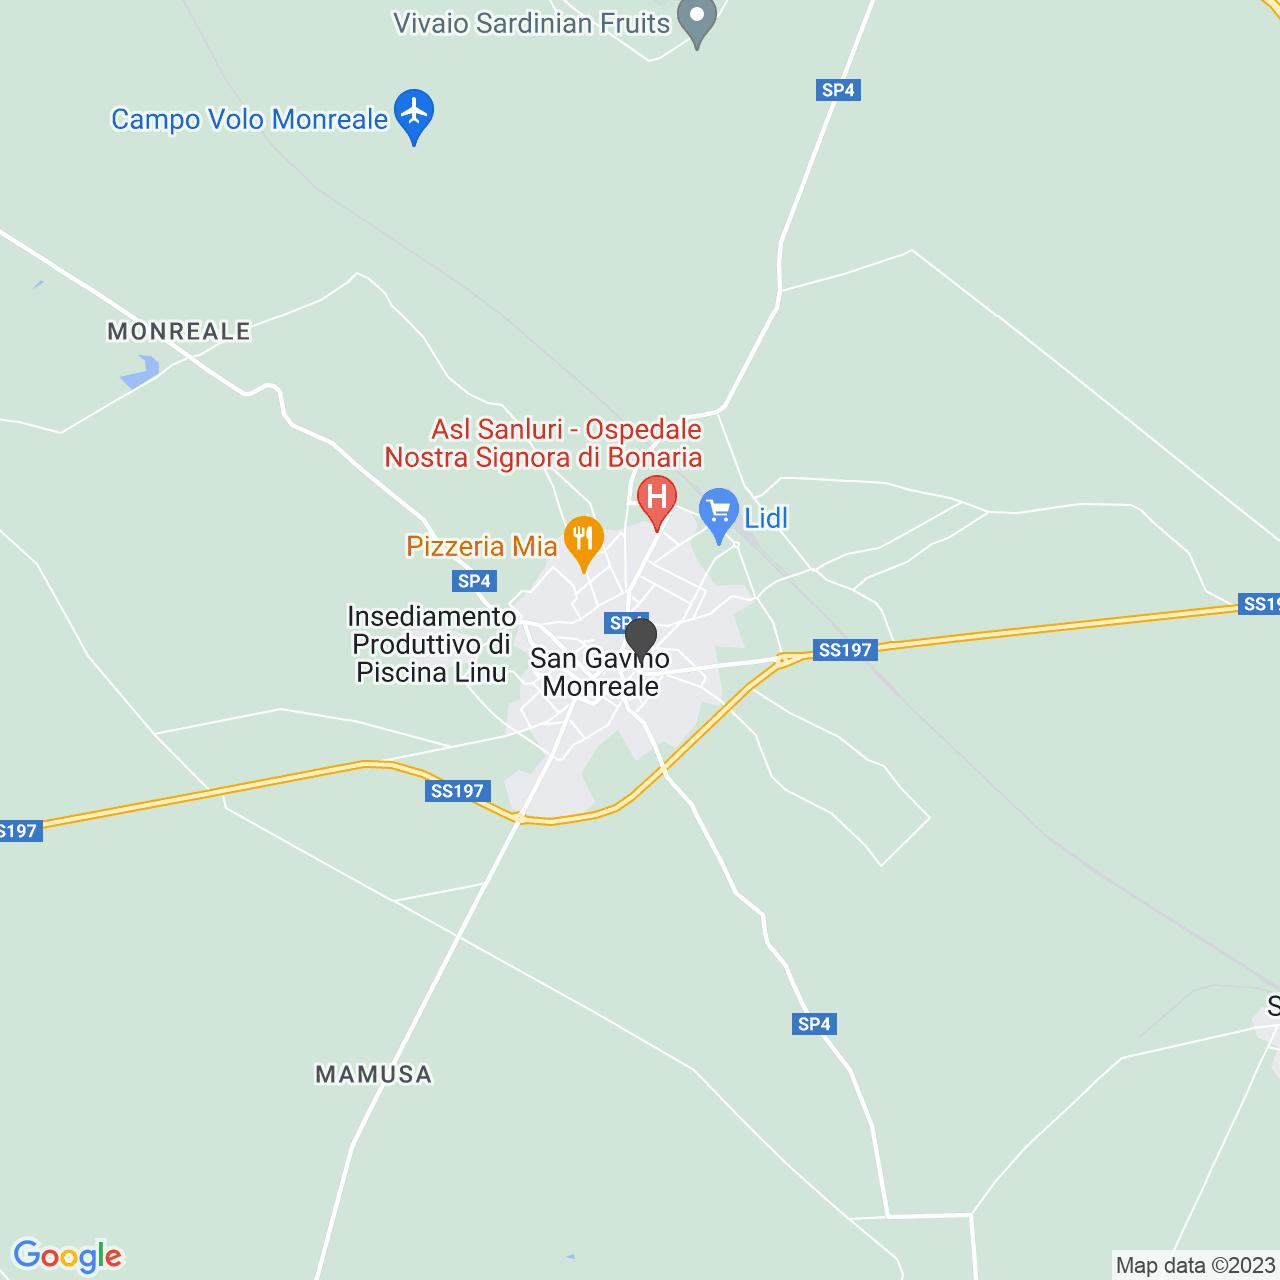 Centro Pastorale